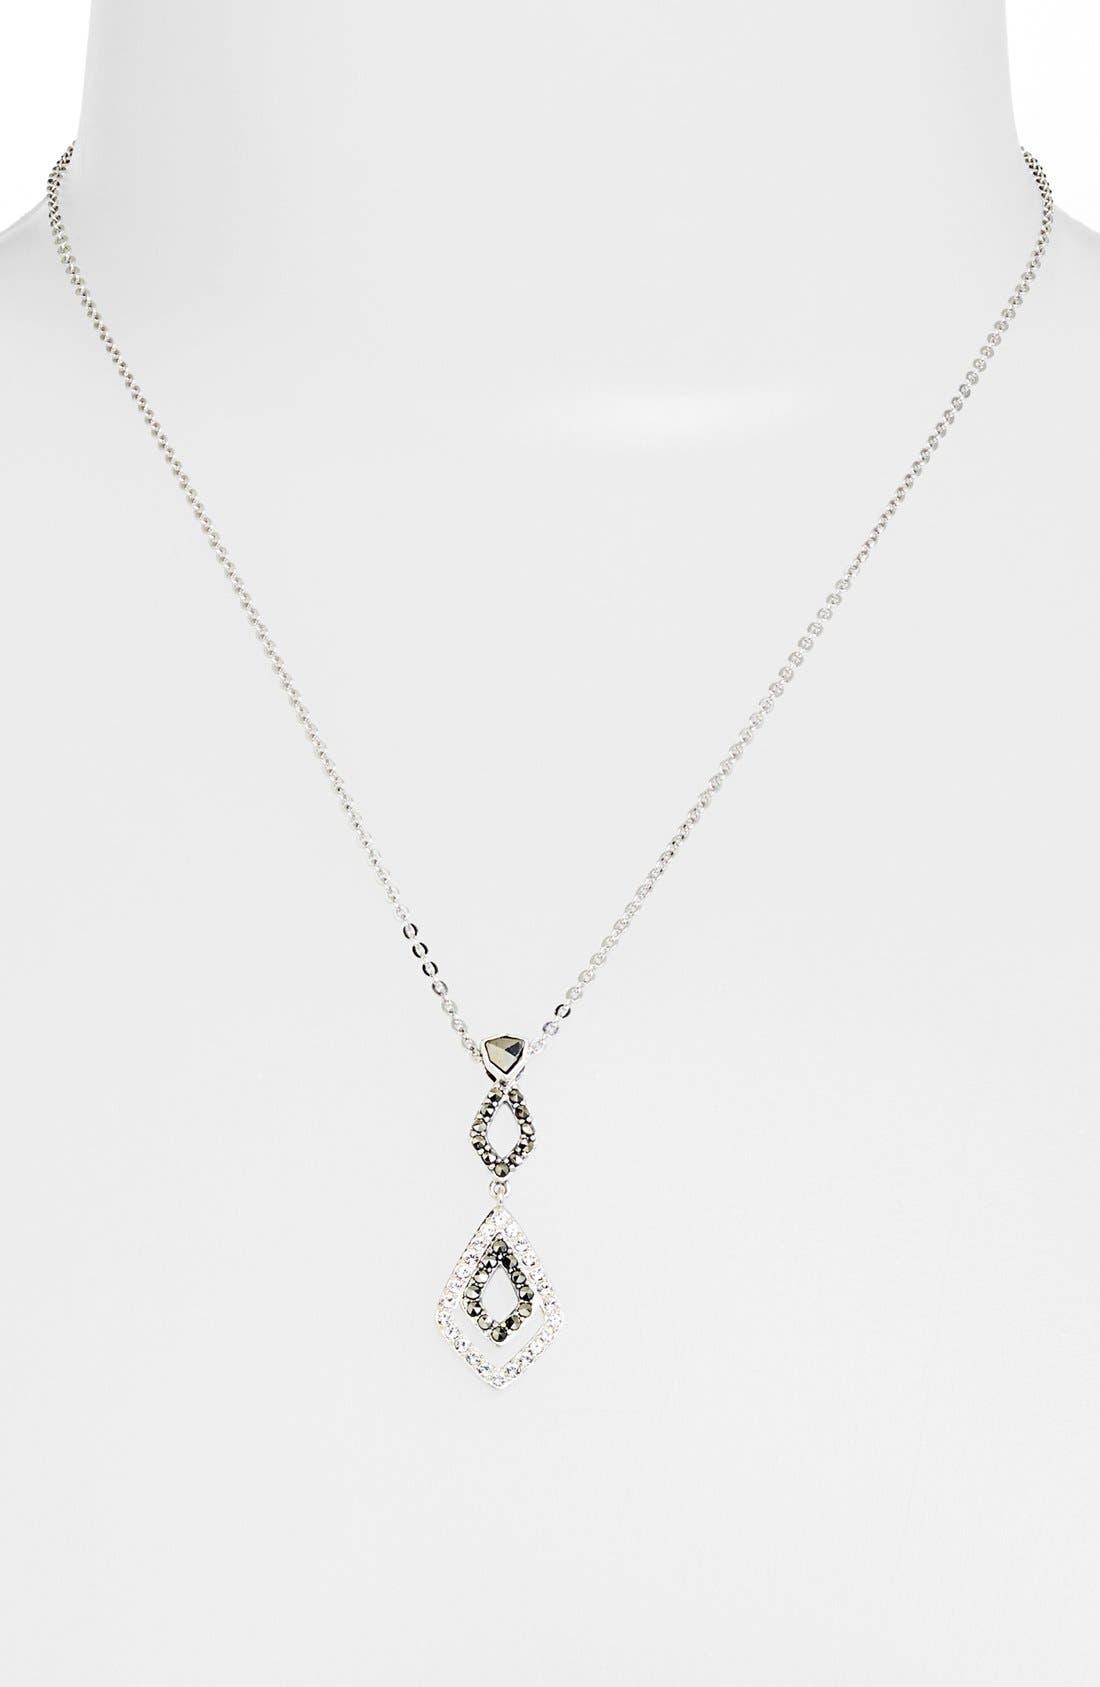 Alternate Image 1 Selected - Judith Jack 'Elegante Envy' Pendant Necklace